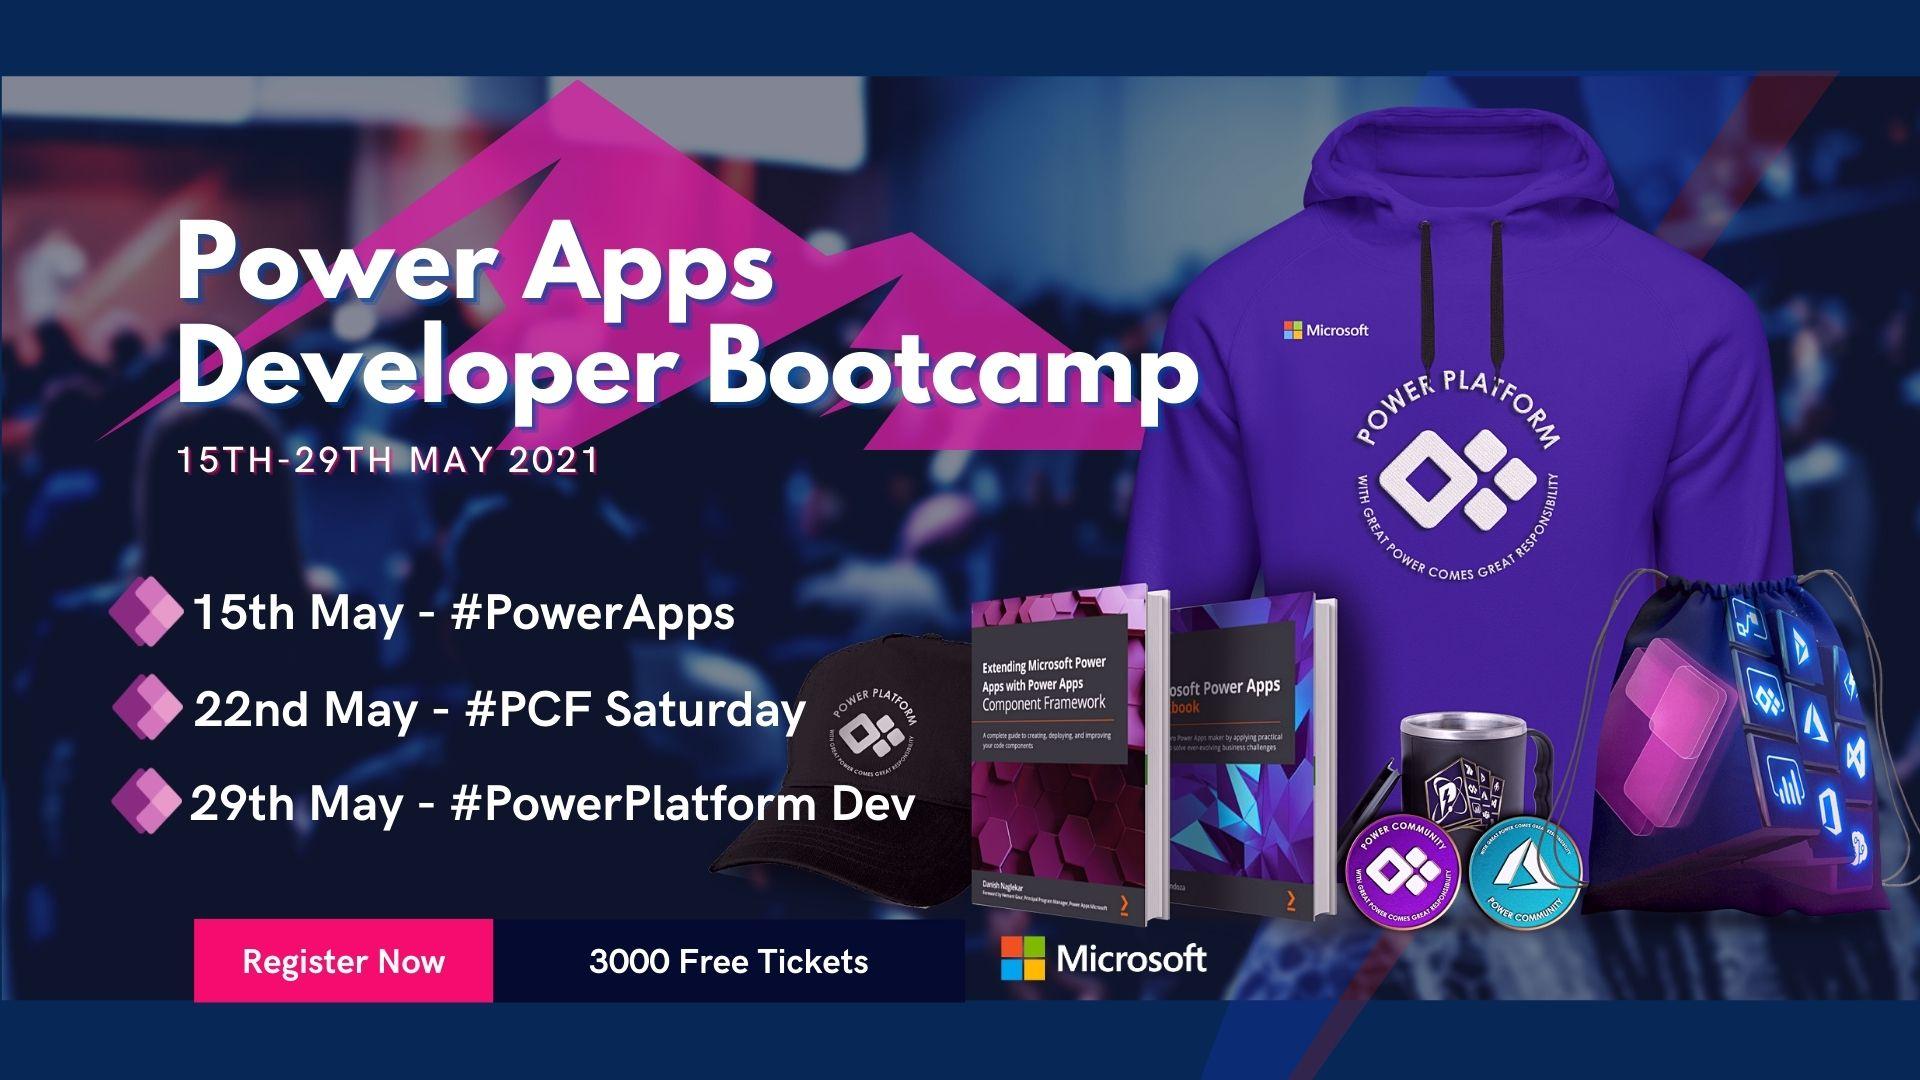 PowerApps Developer Bootcamp